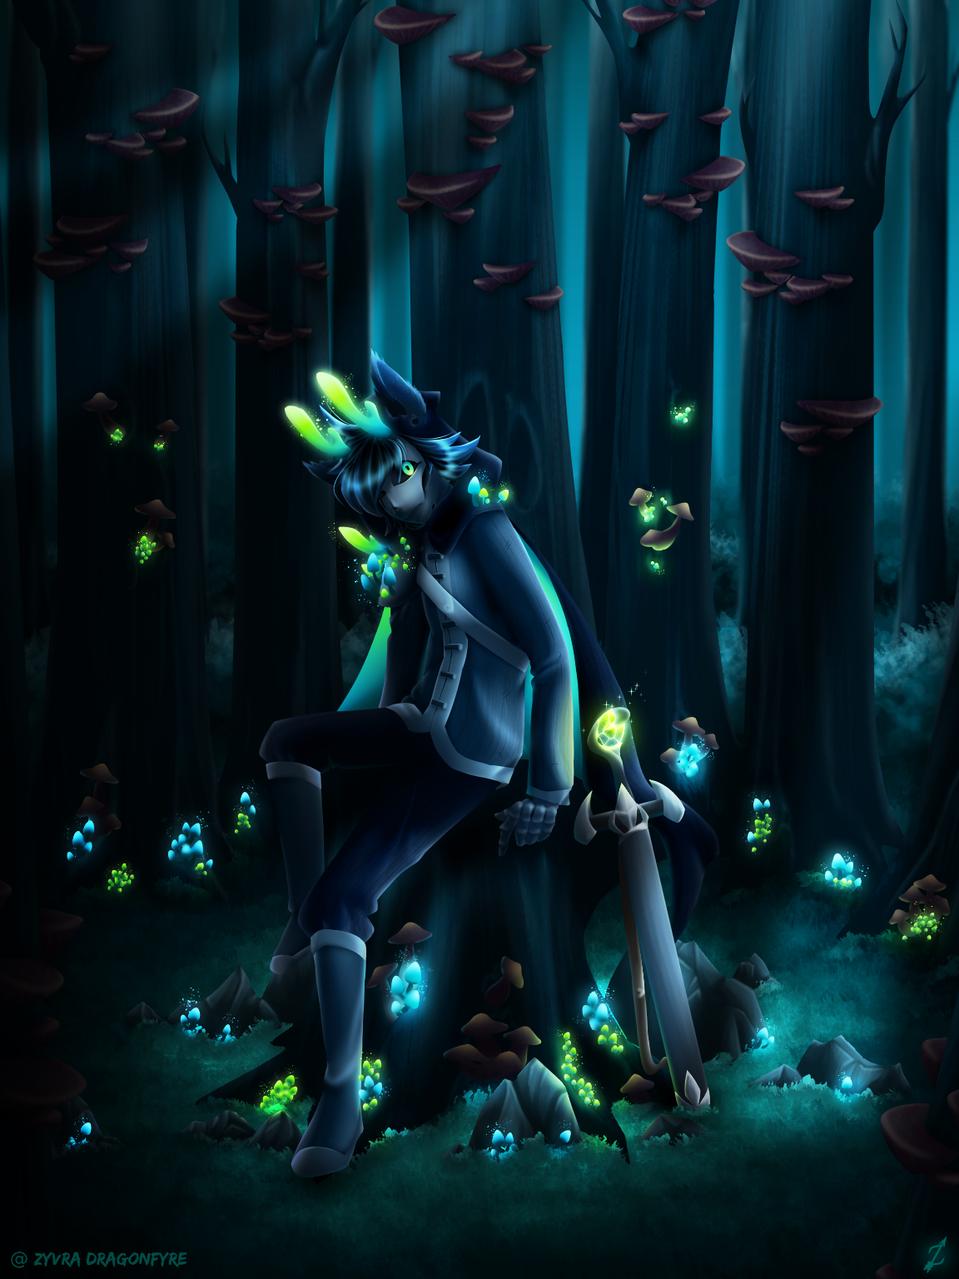 Lueur Voilée Illust of Zyvra Dragonfyre fantasy medibangpaint magic mushroom forest Sans furry fungi skeleton undertale oc